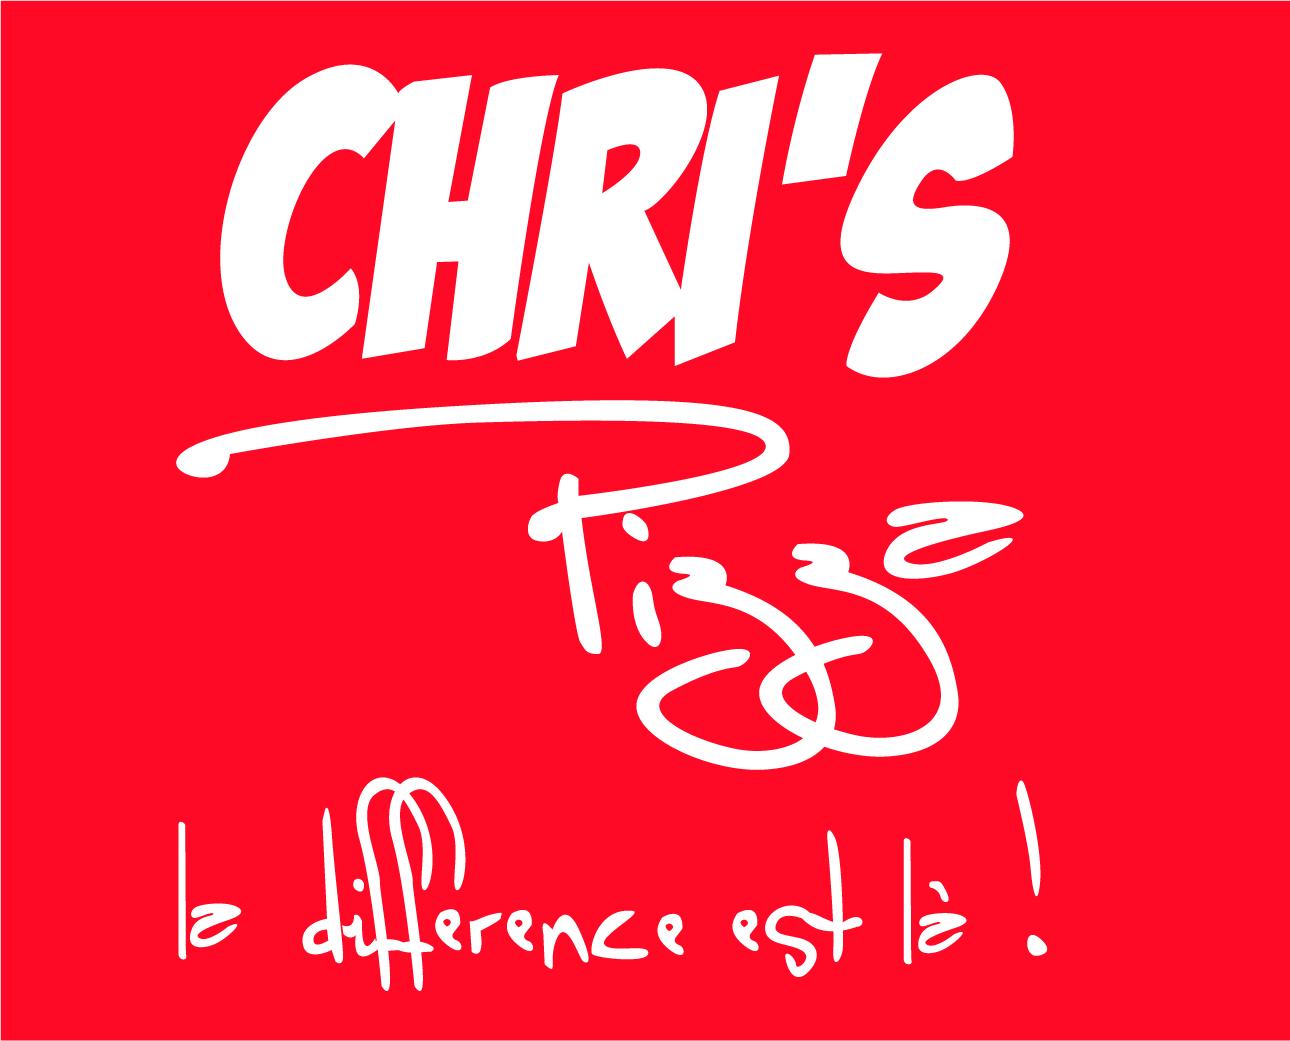 ChrisPizza